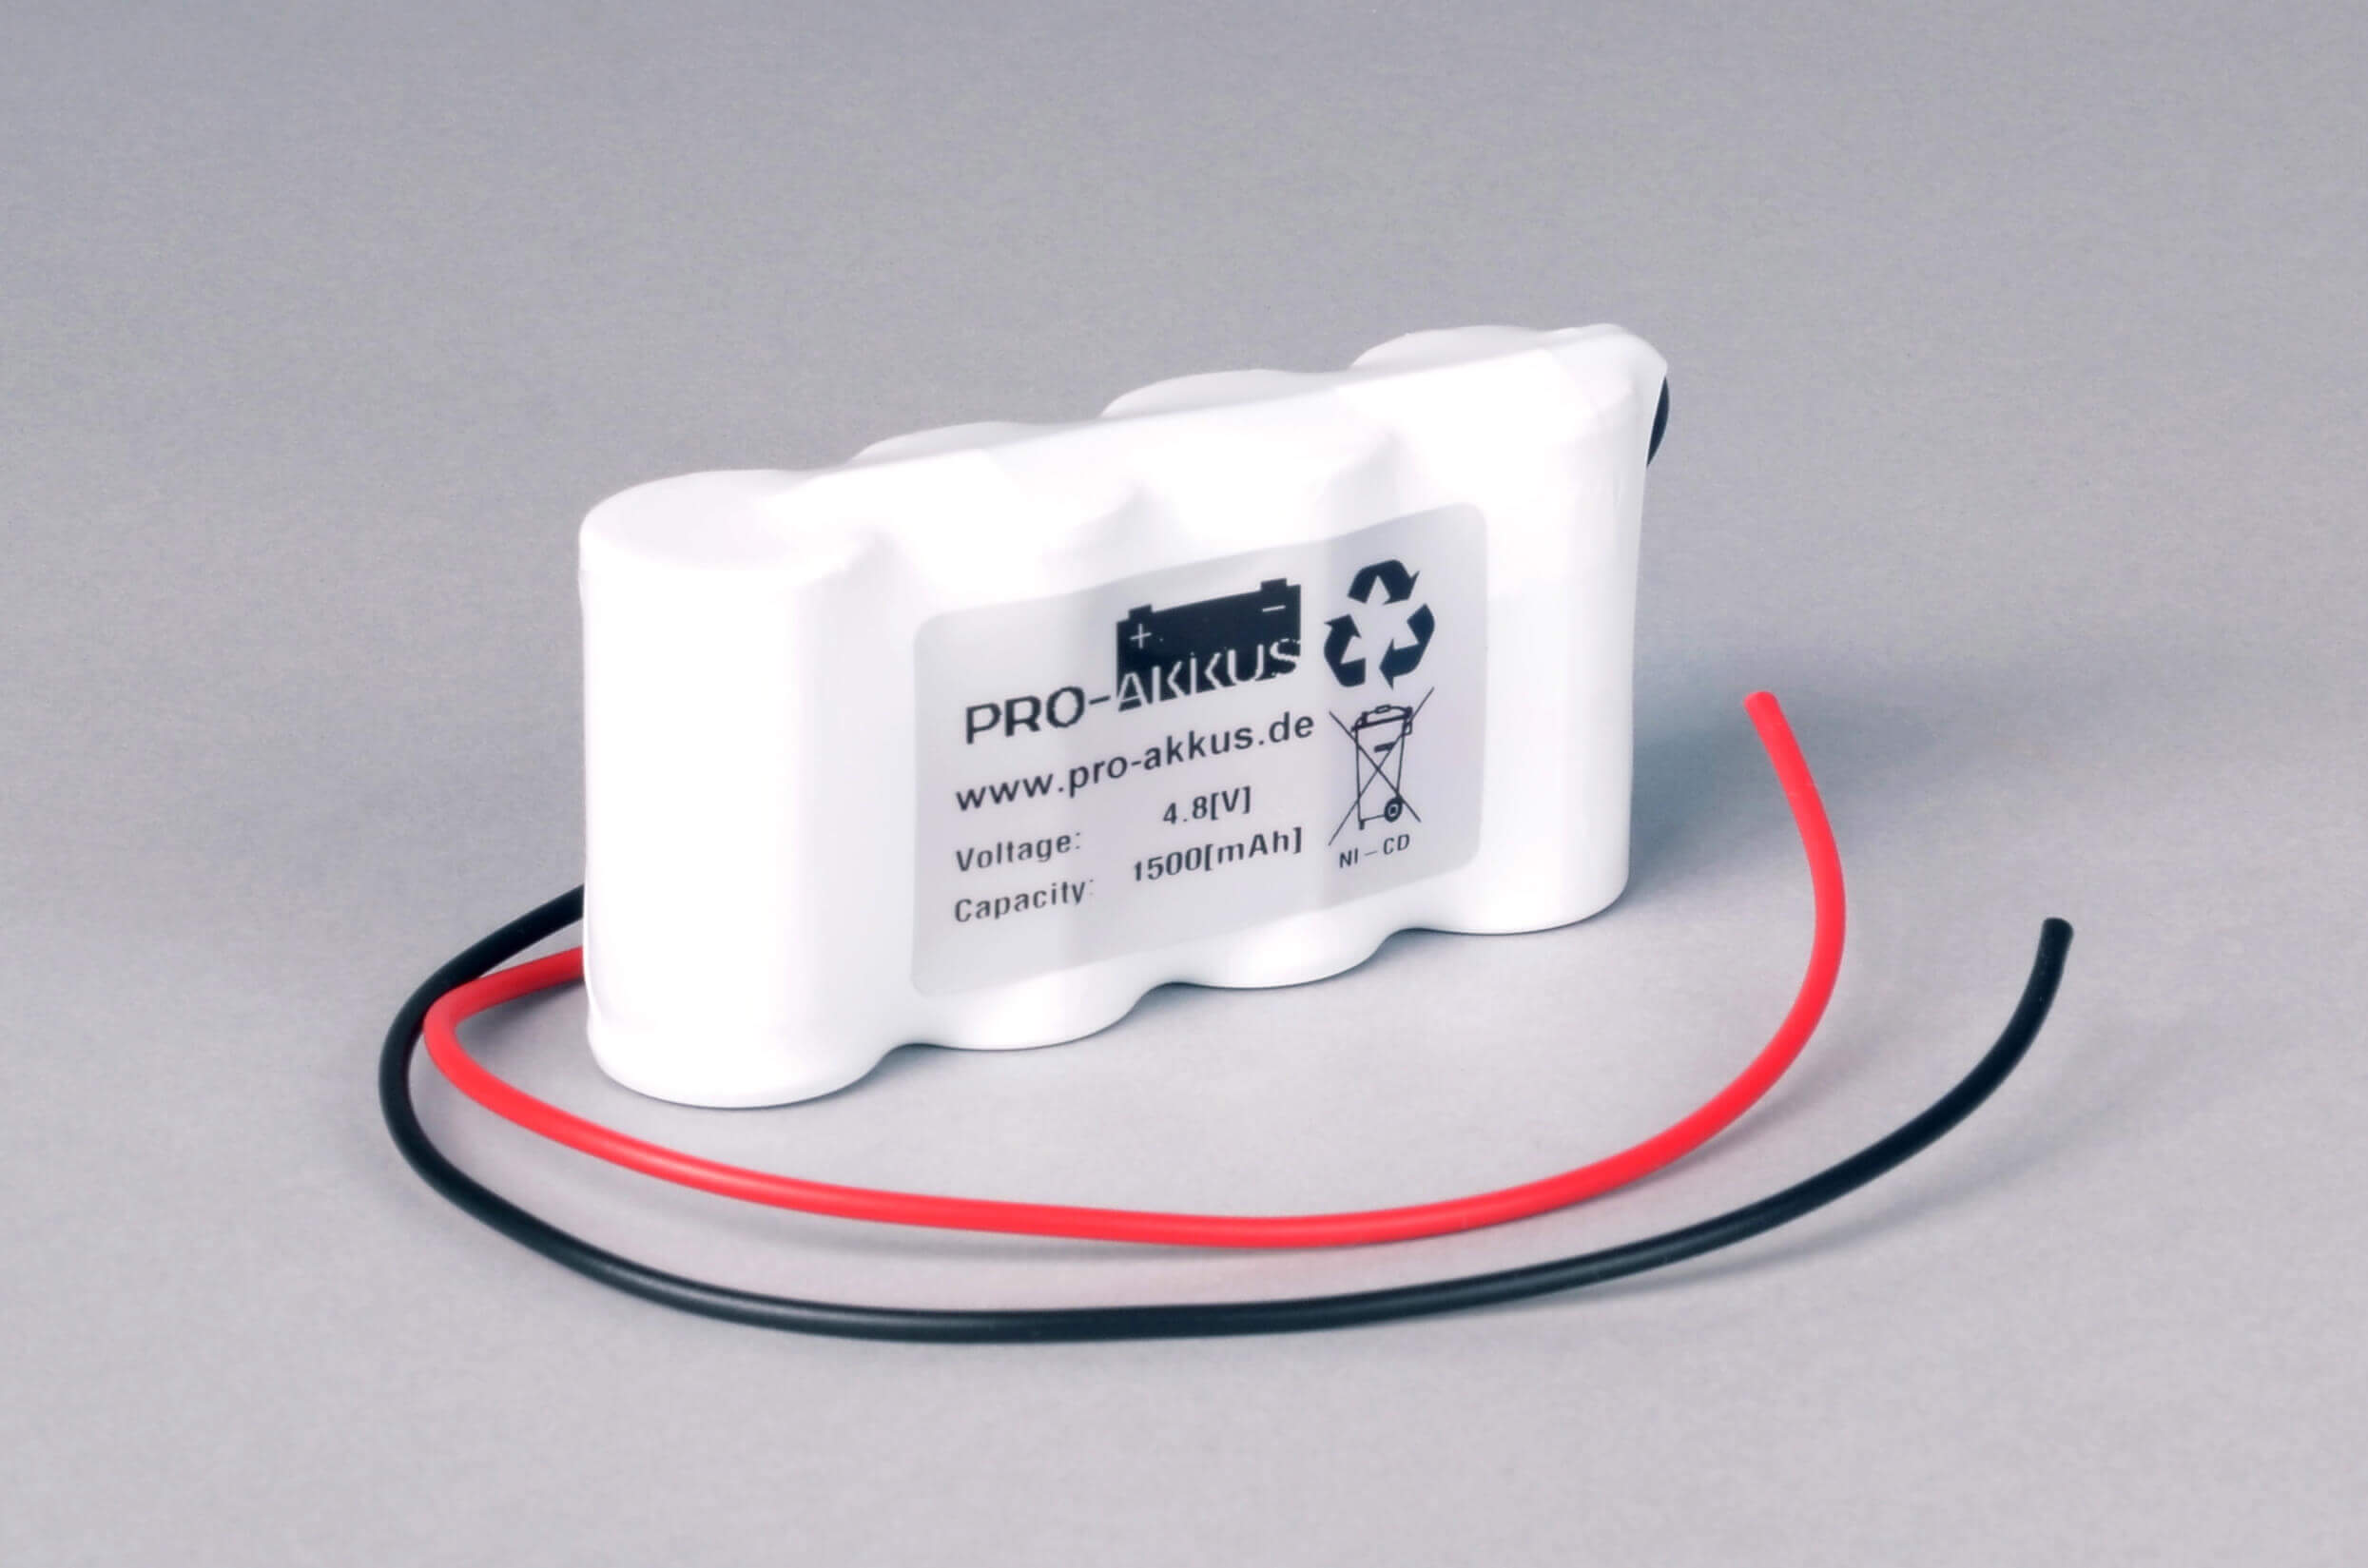 Ni-Cd Akkupack Notlicht Notbeleuchtung 4,8V / 1500mAh (1,5Ah) F4x1 Reihe mit Kabel